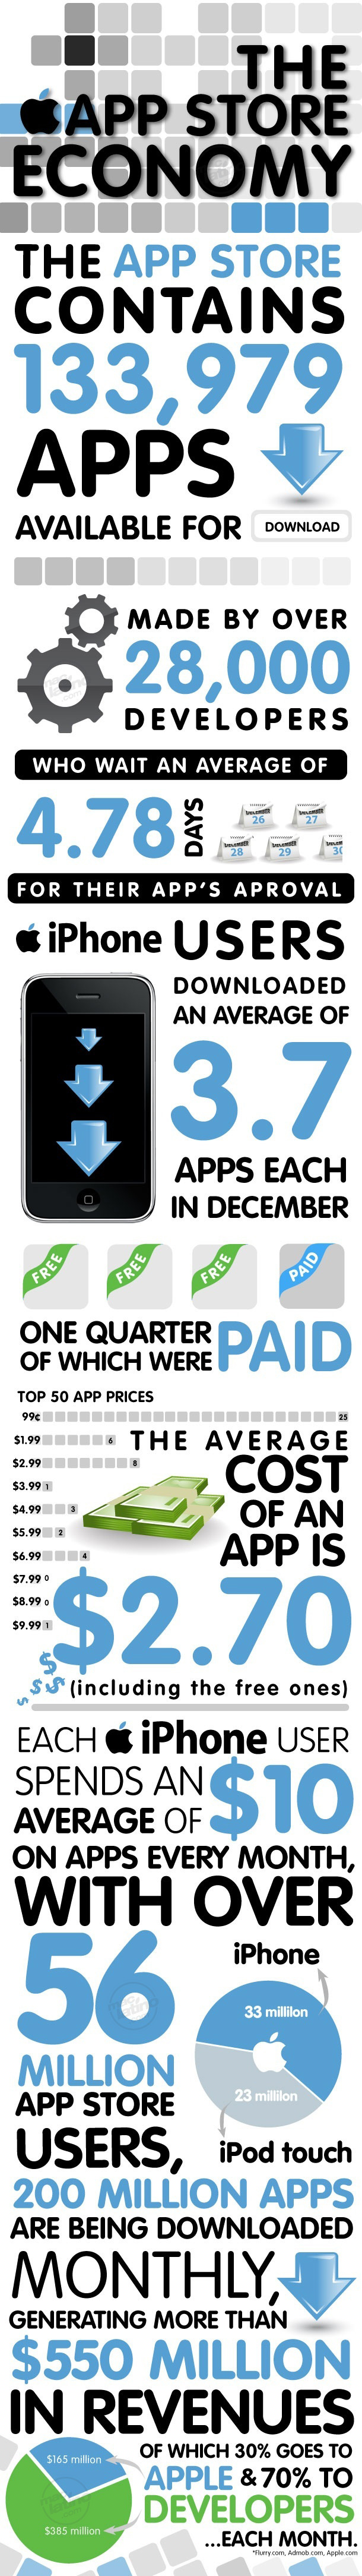 La economía de la App Store de Apple 1